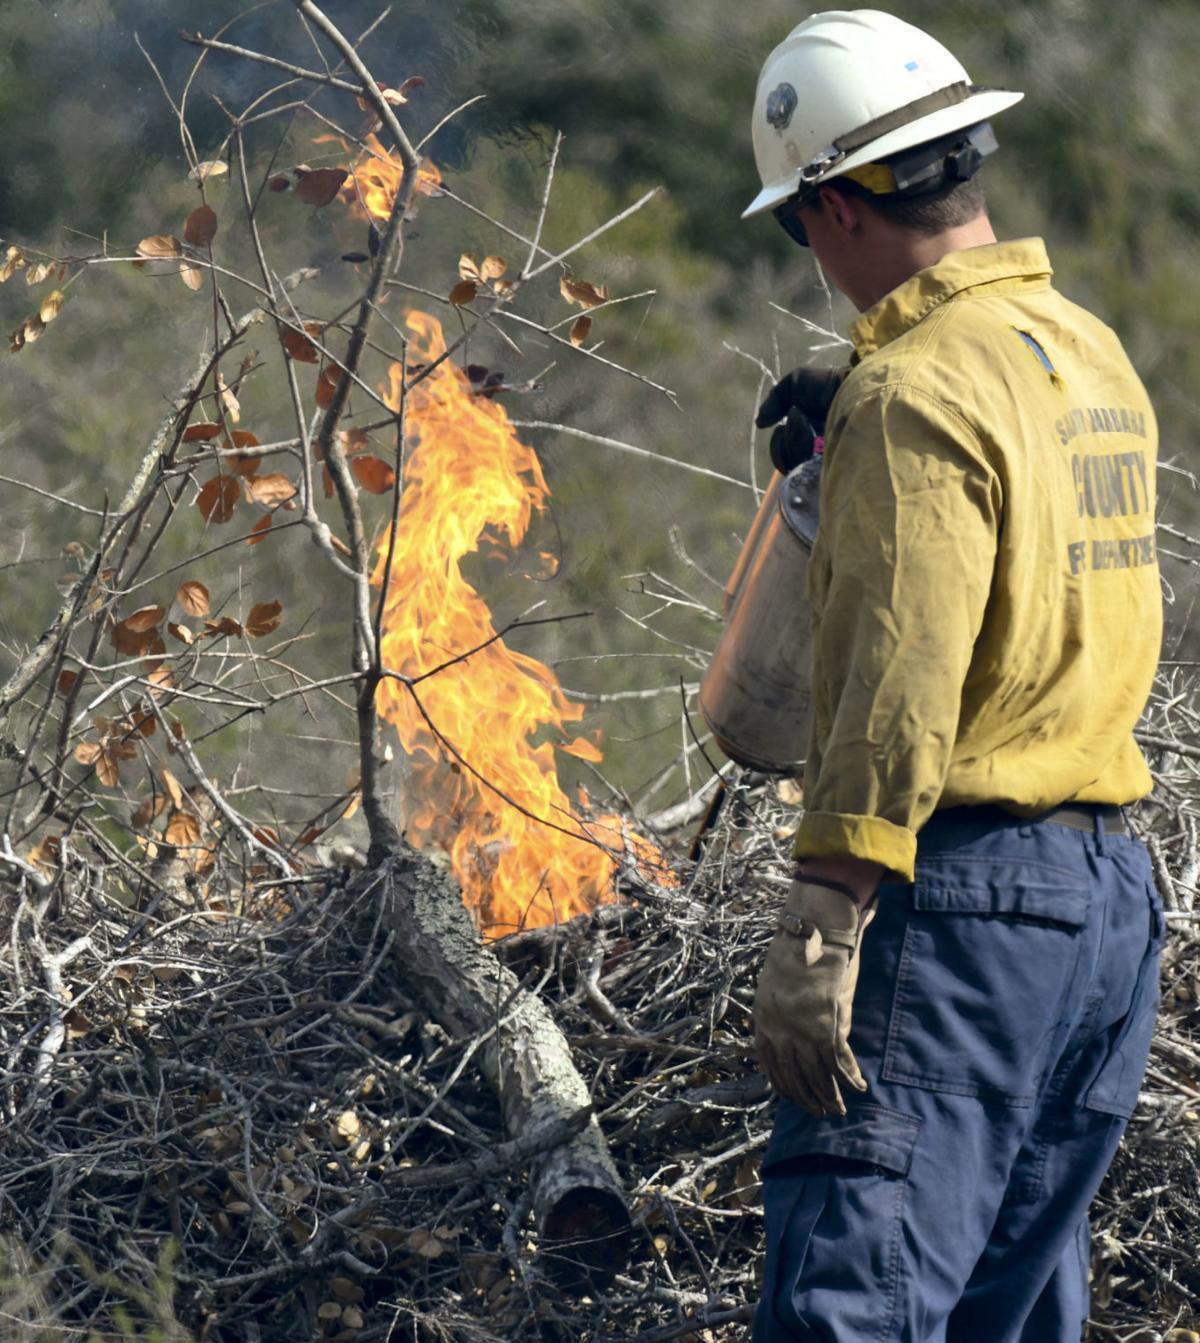 022619 Burton Mesa burn piles 02.jpg